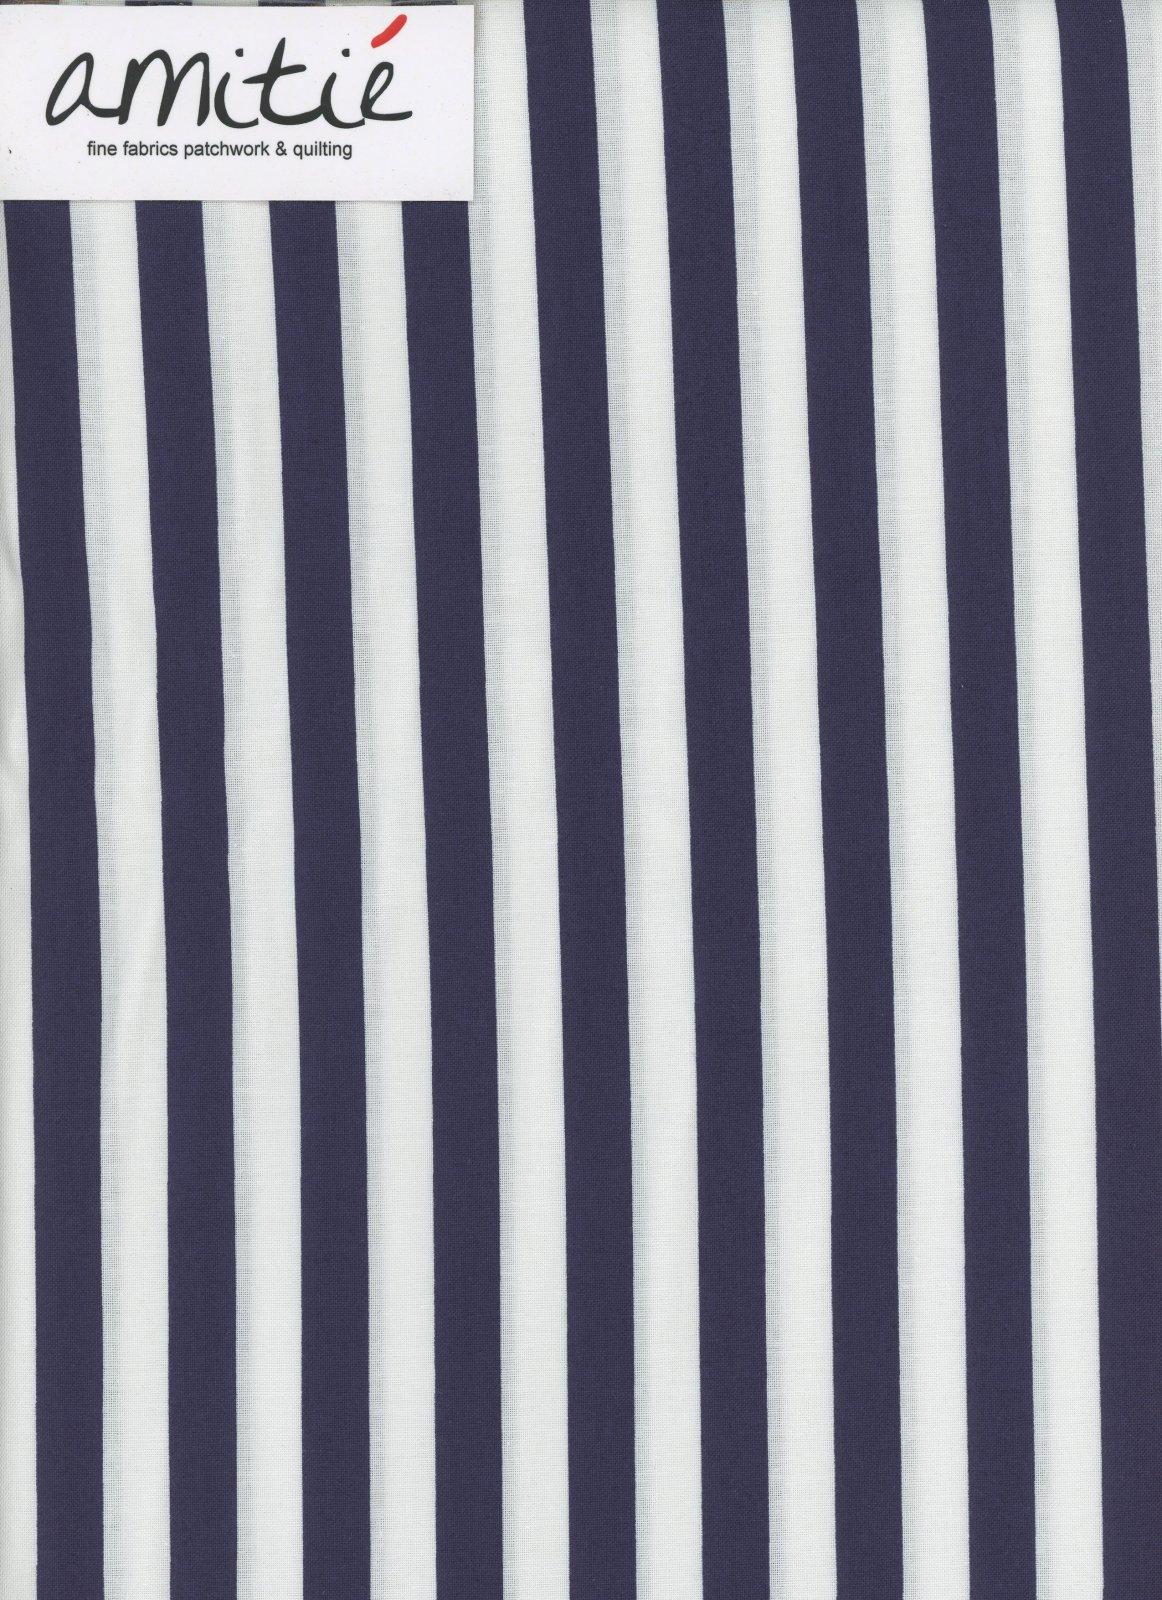 Le Creme - 1/2 Navy/Cream Stripe